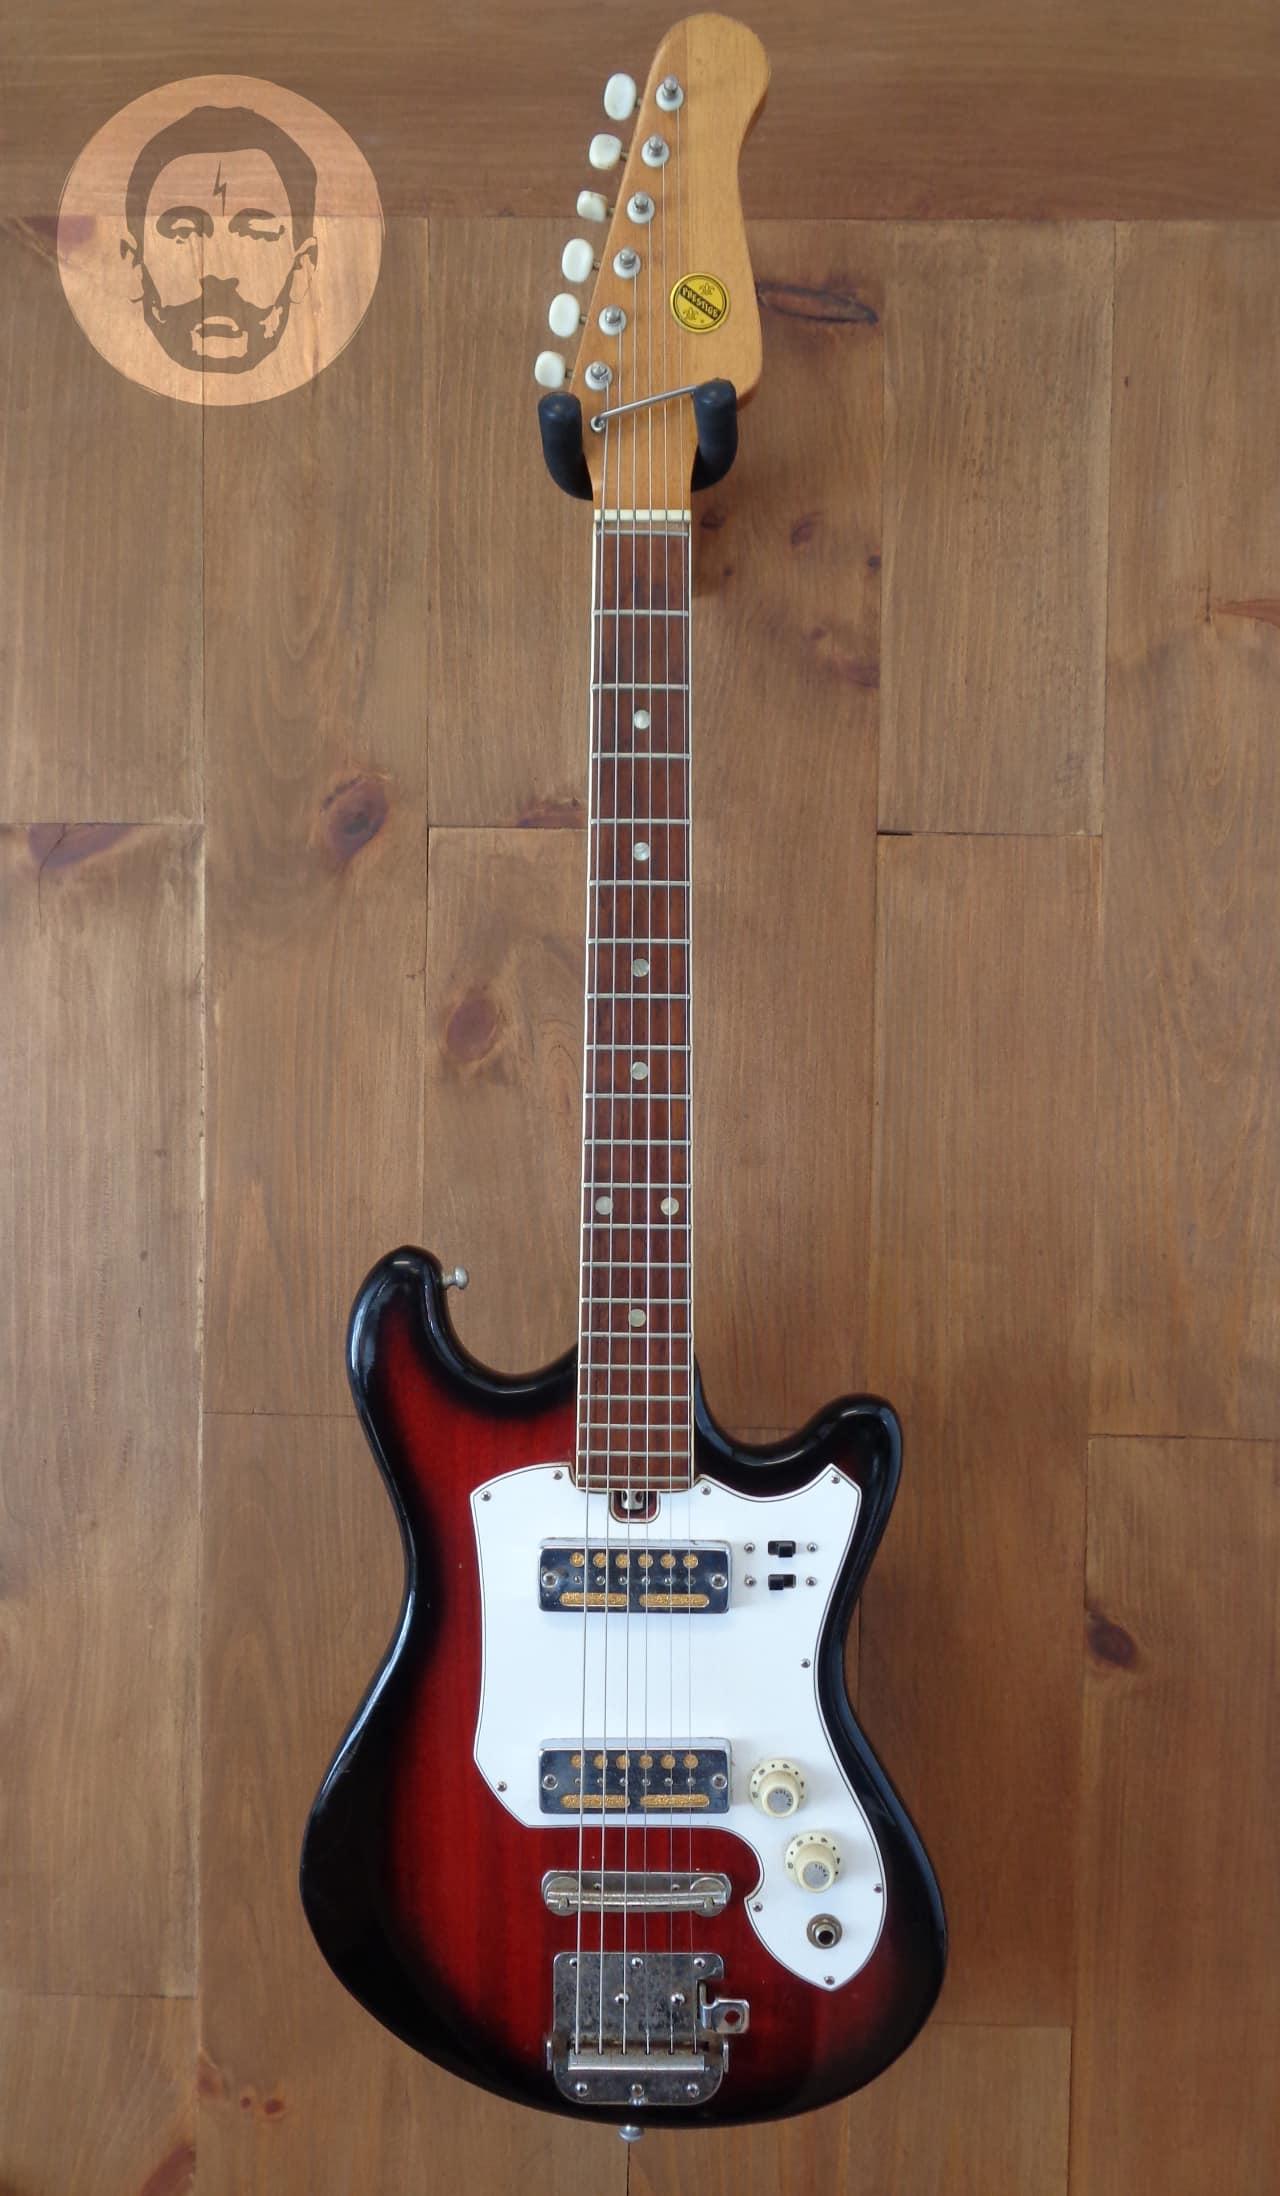 Teisco Prestige Electric Guitar Ibanez Rga42 Wiring Diagram Redburst Dual Gold Foil Pickups Reverb 1280x2196